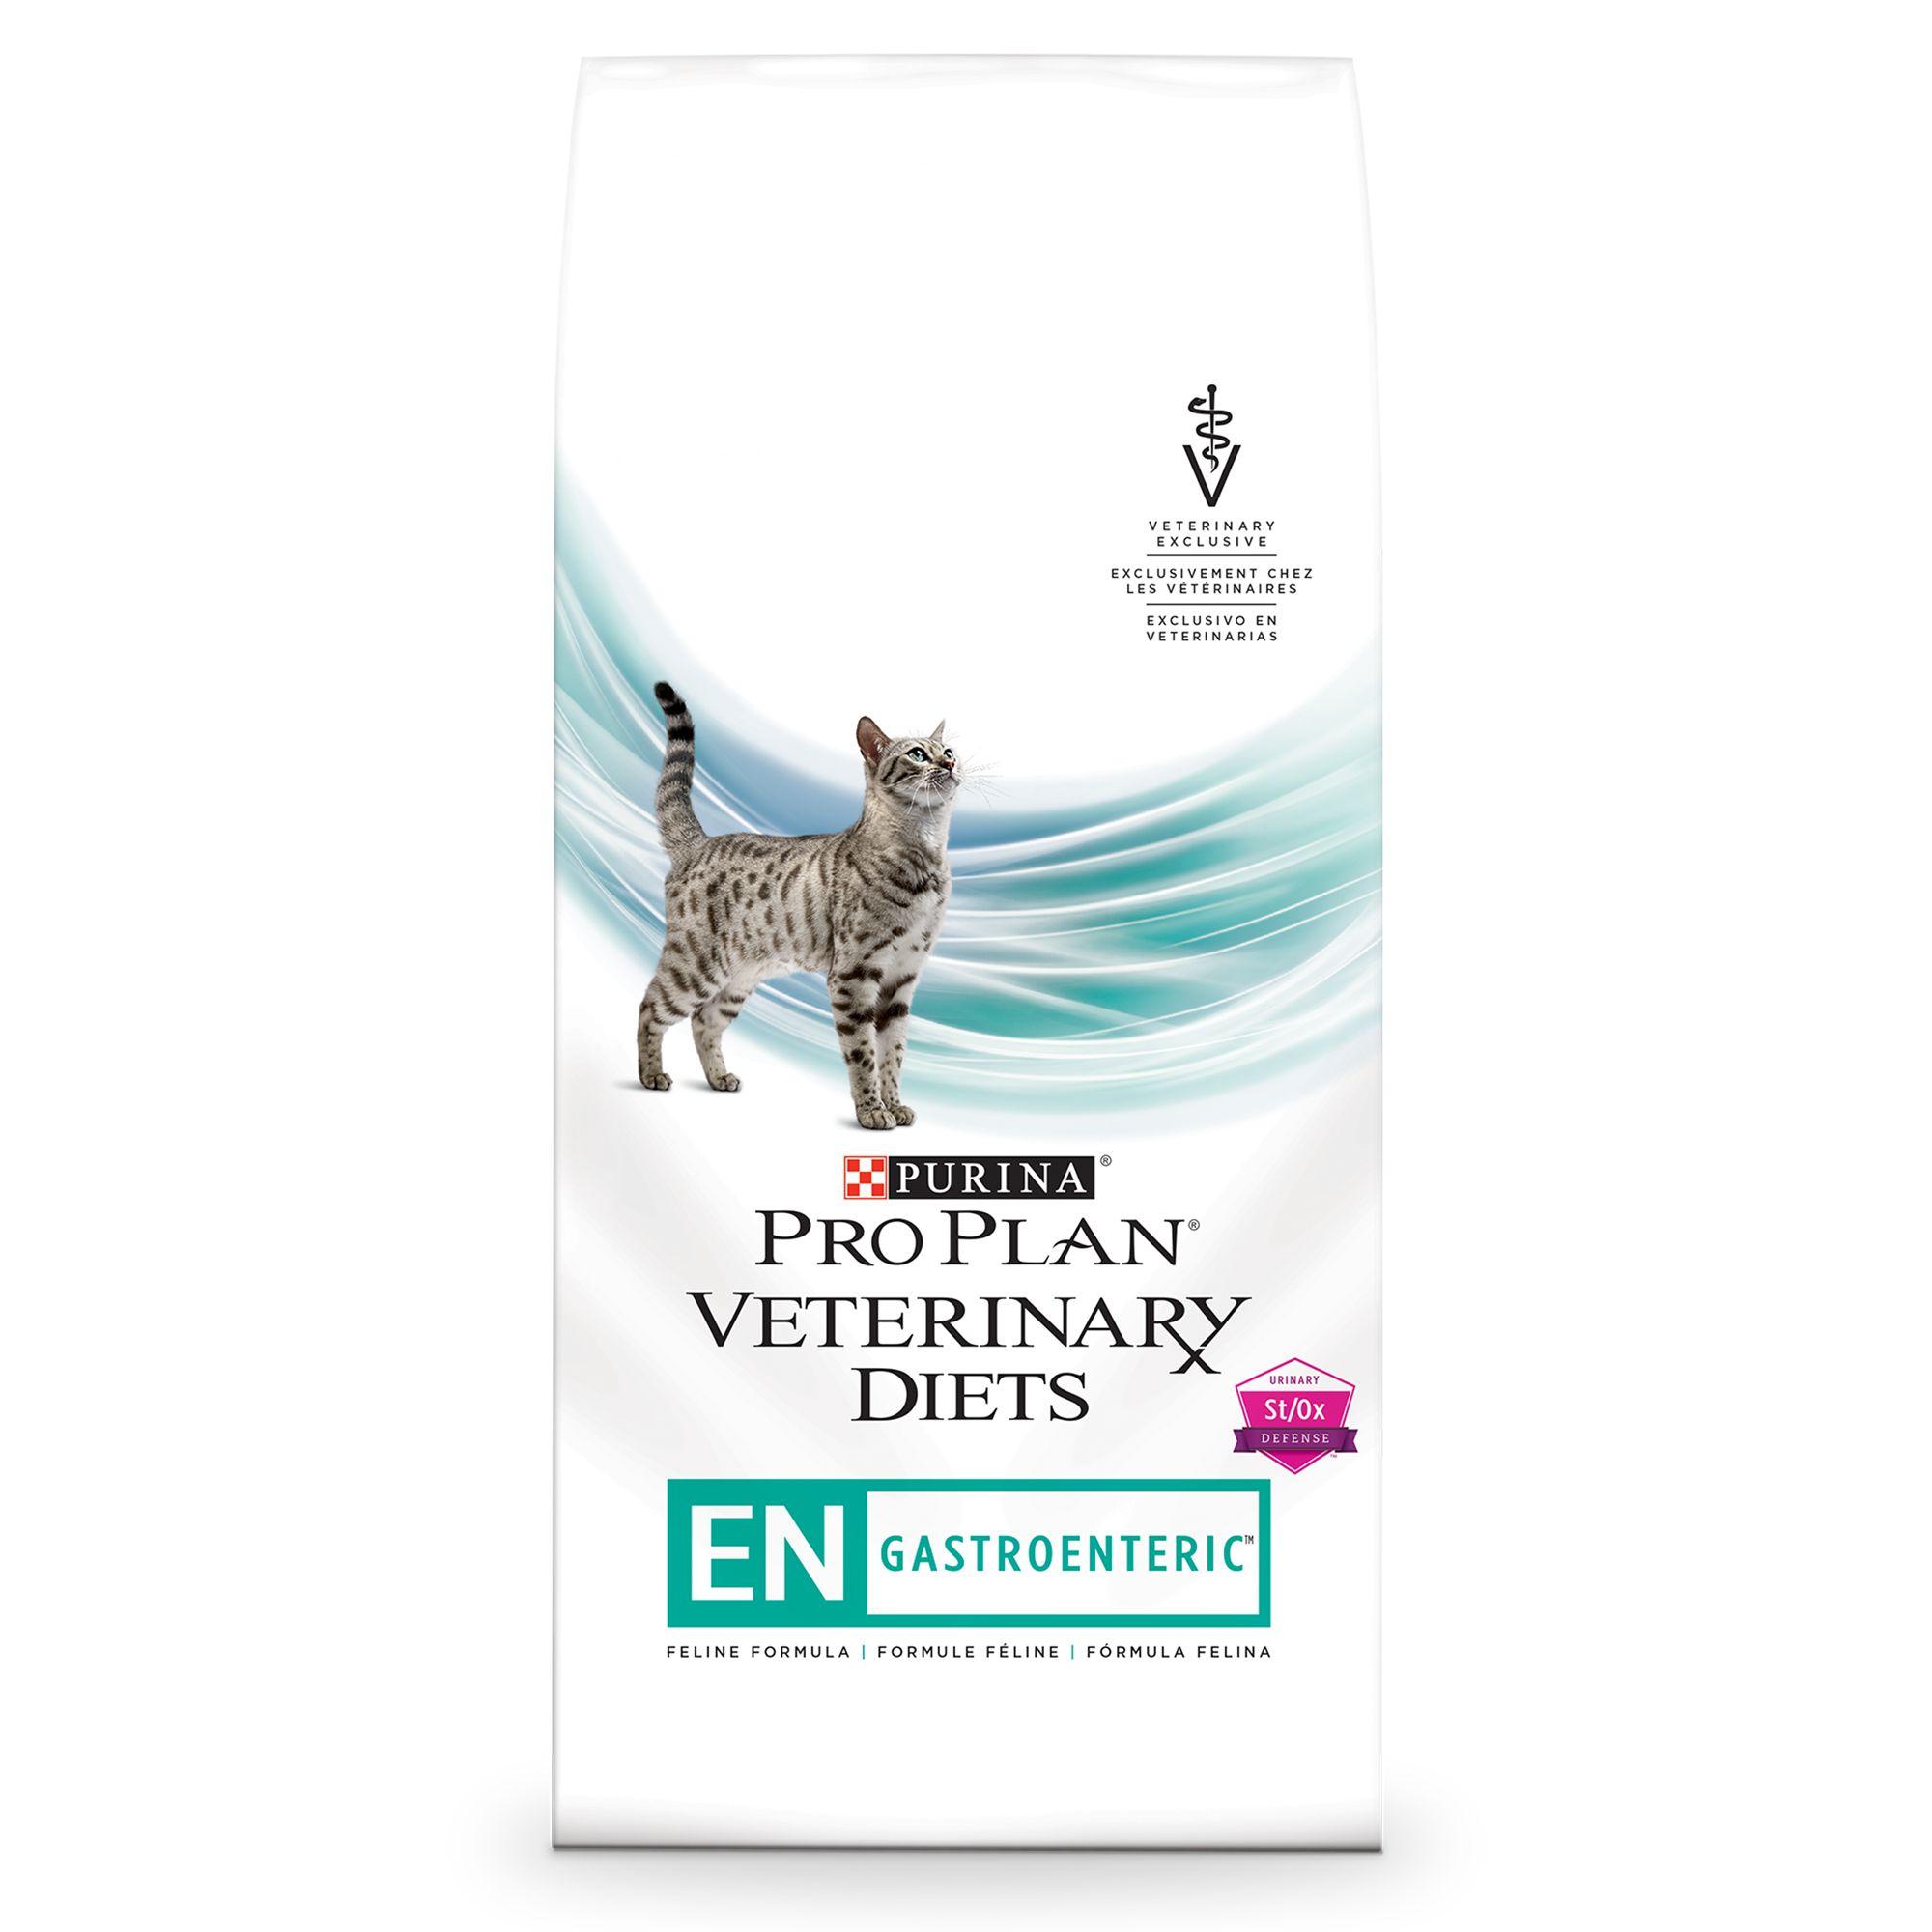 Purina Pro Plan Veterinary Diets Cat Food En Gatroenteric